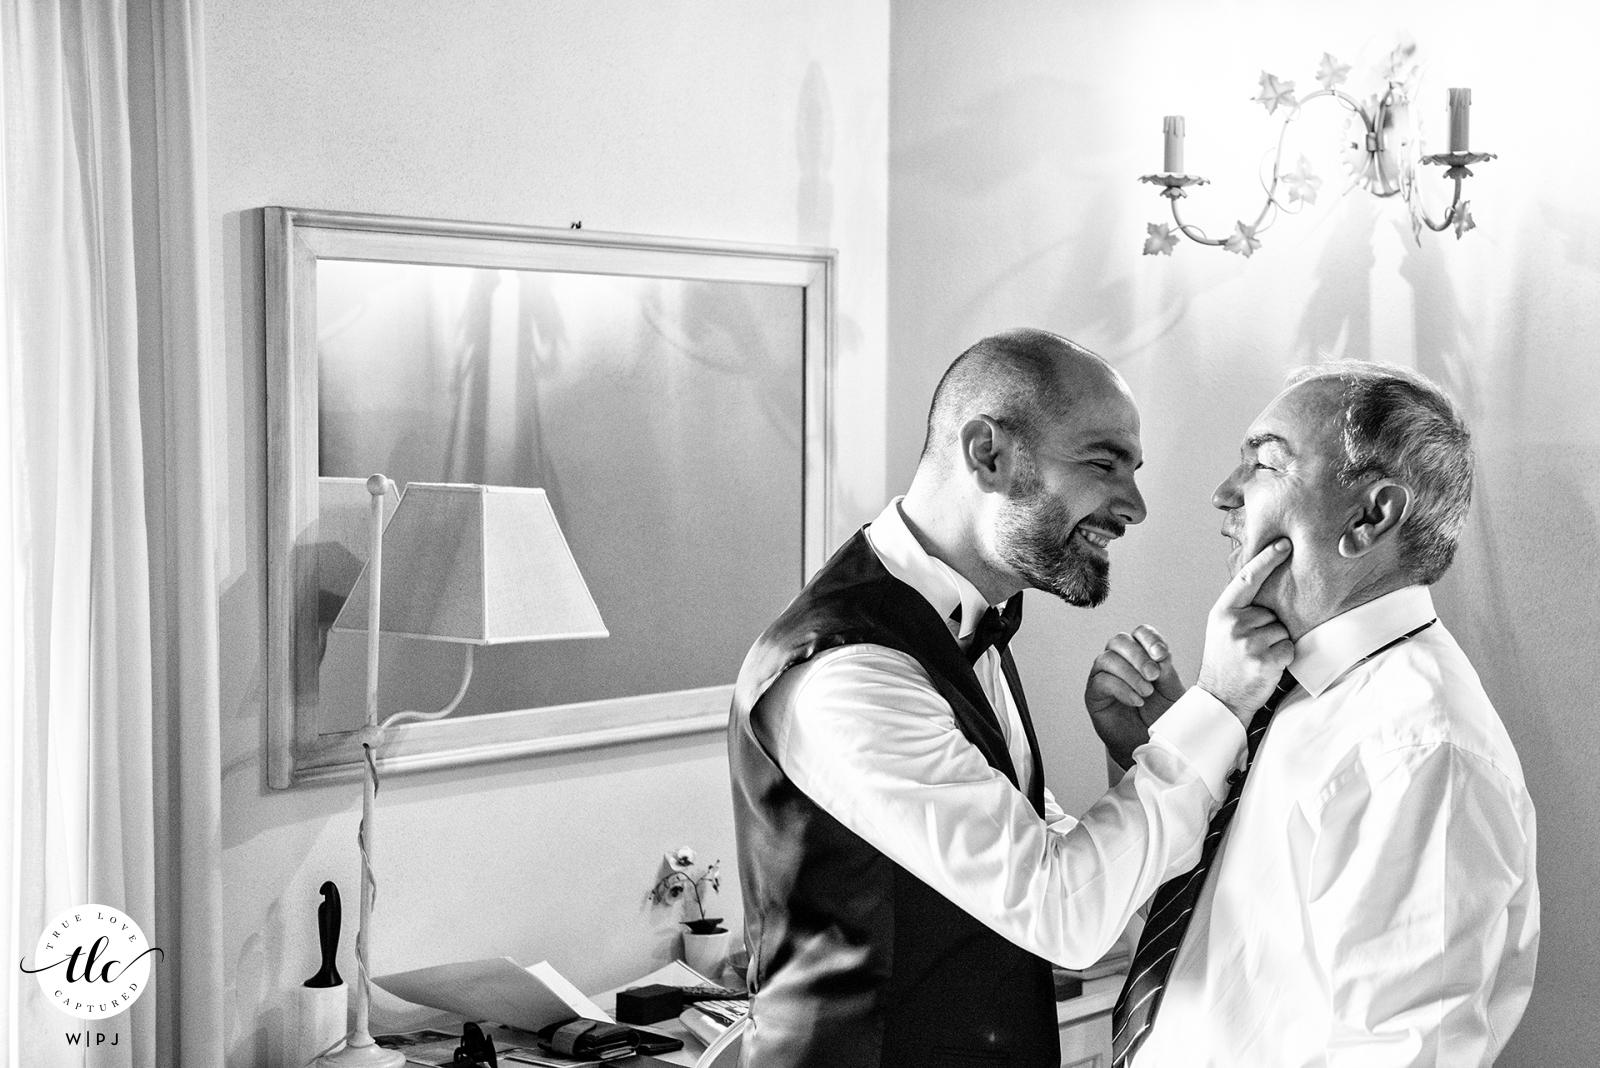 Antico Benessere, Vaprio d'Adda, Milán - Italia lugar de la boda imagen de un gesto cariñoso entre padre e hijo